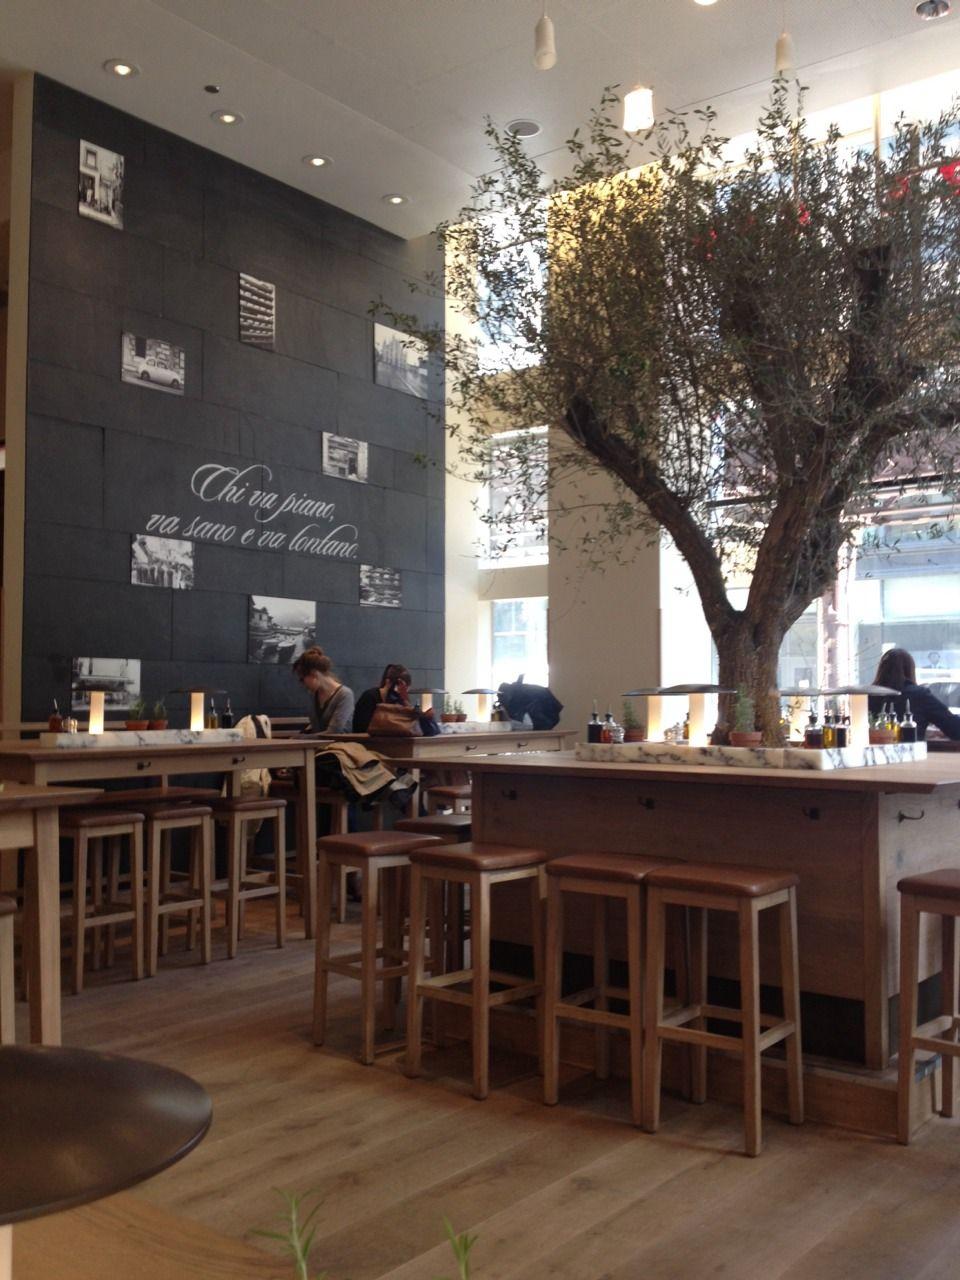 Decoraci n naturalista dentro de una cafeter a flowers deco nature coffeehouse deco - Diseno cafeterias modernas ...